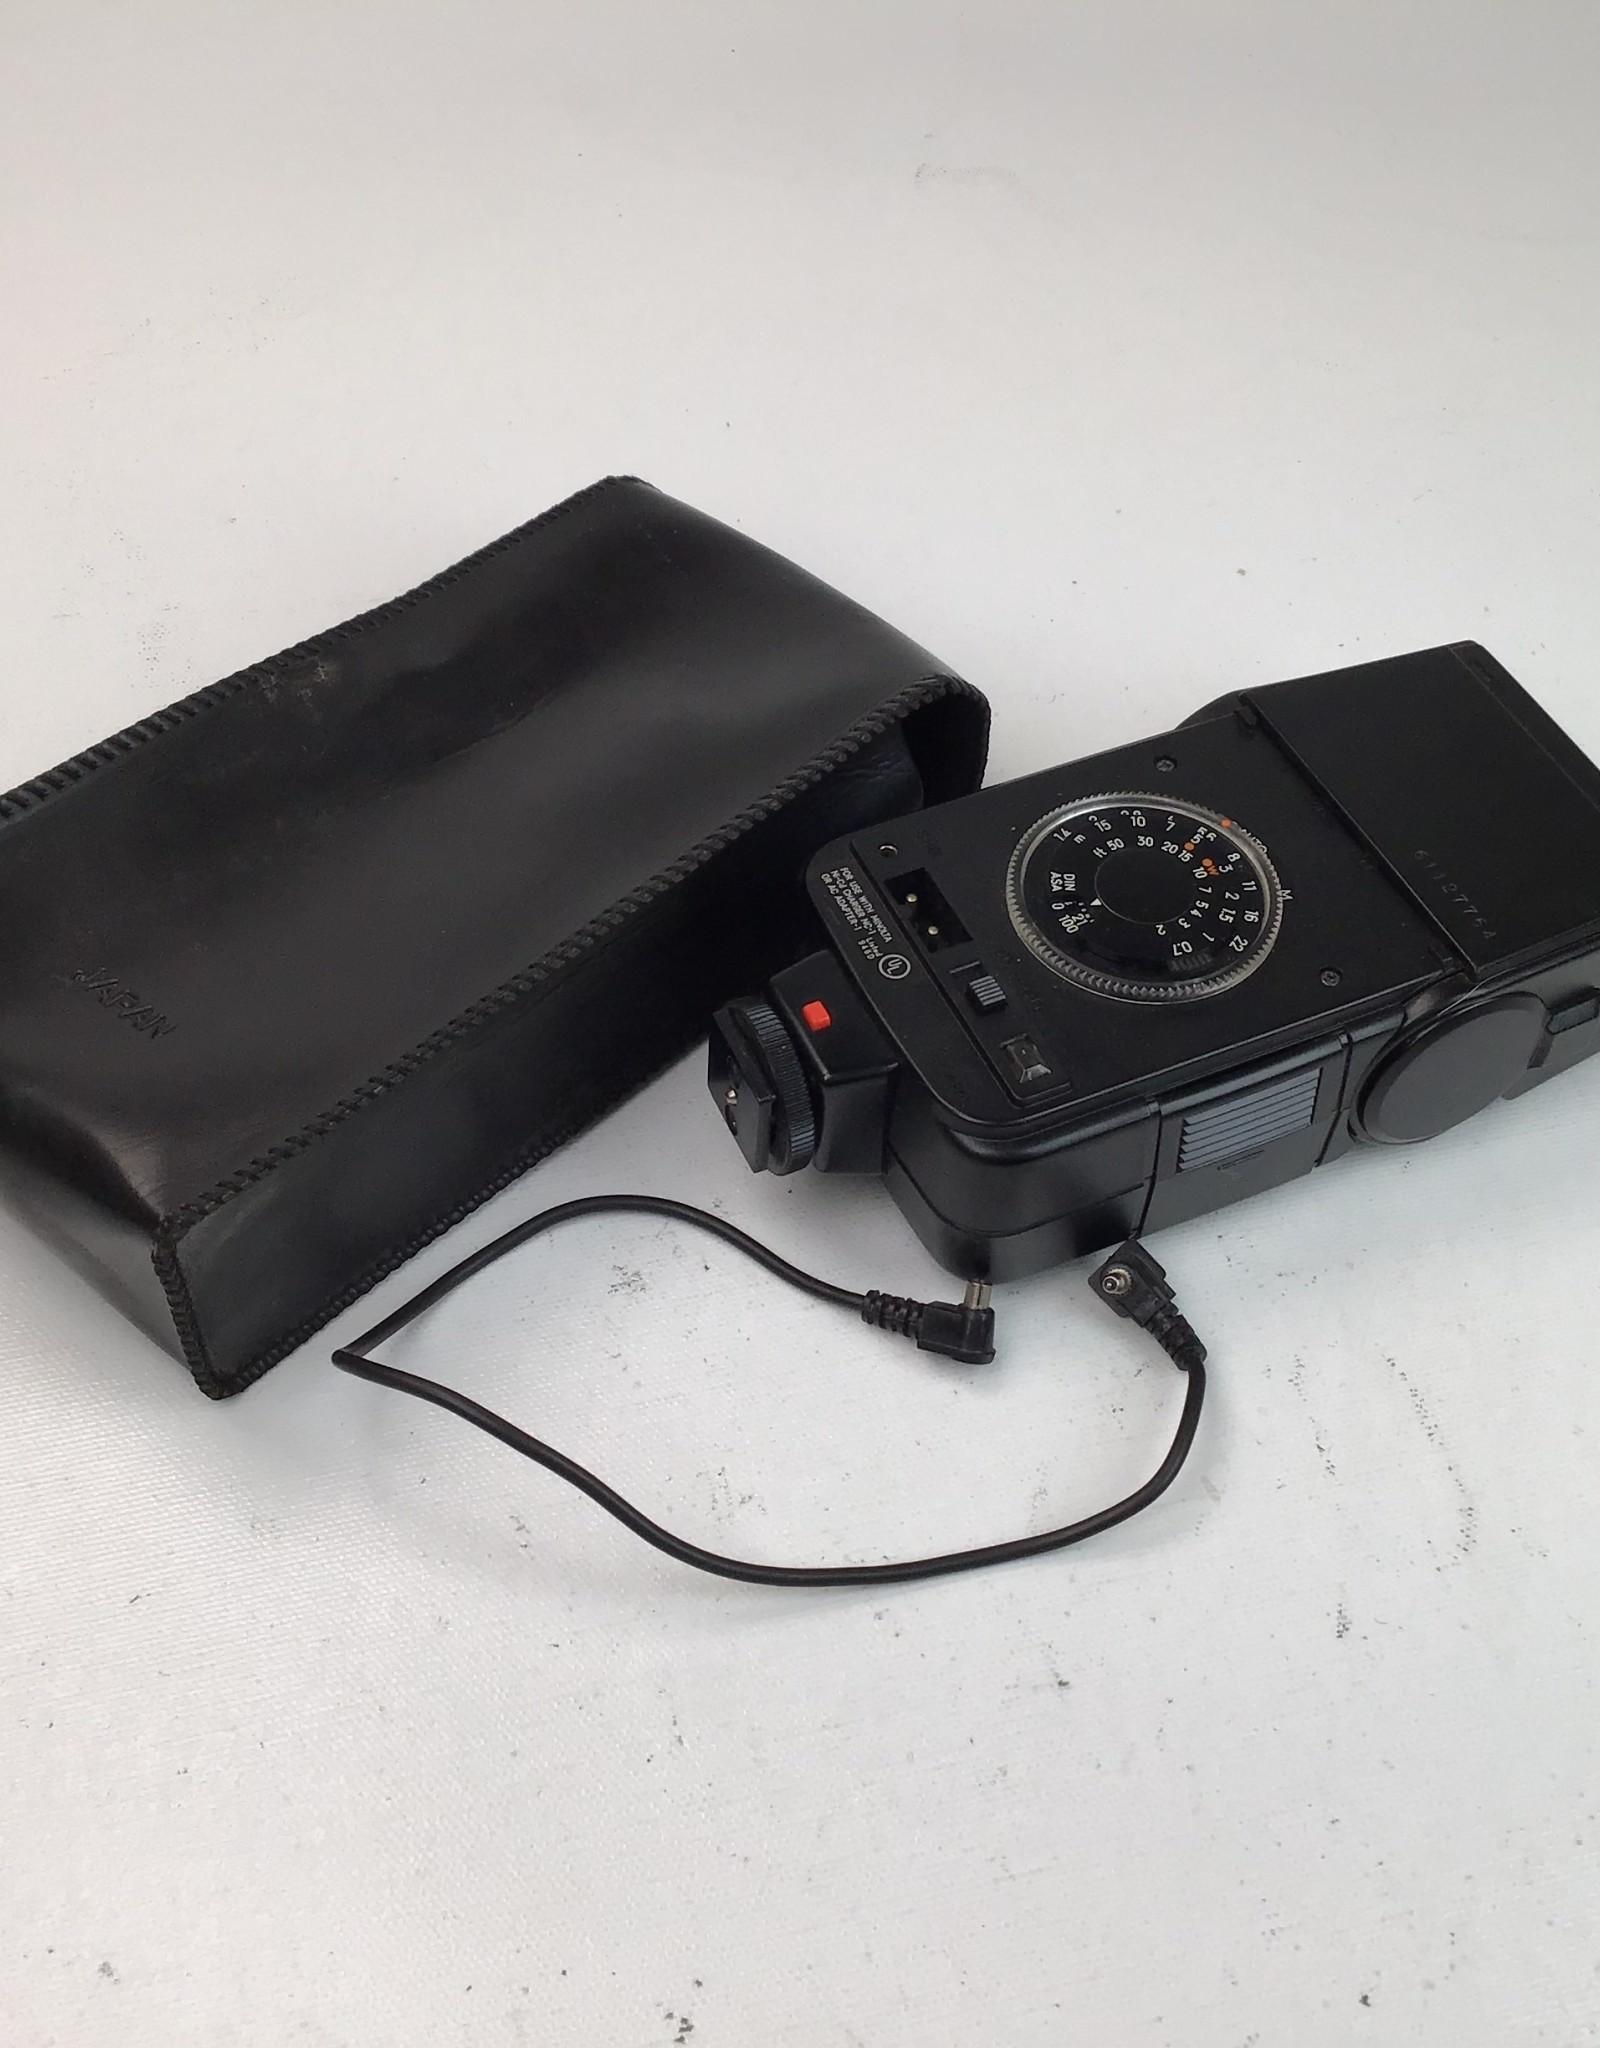 Minolta Minolta Auto 28 Flash Used Good